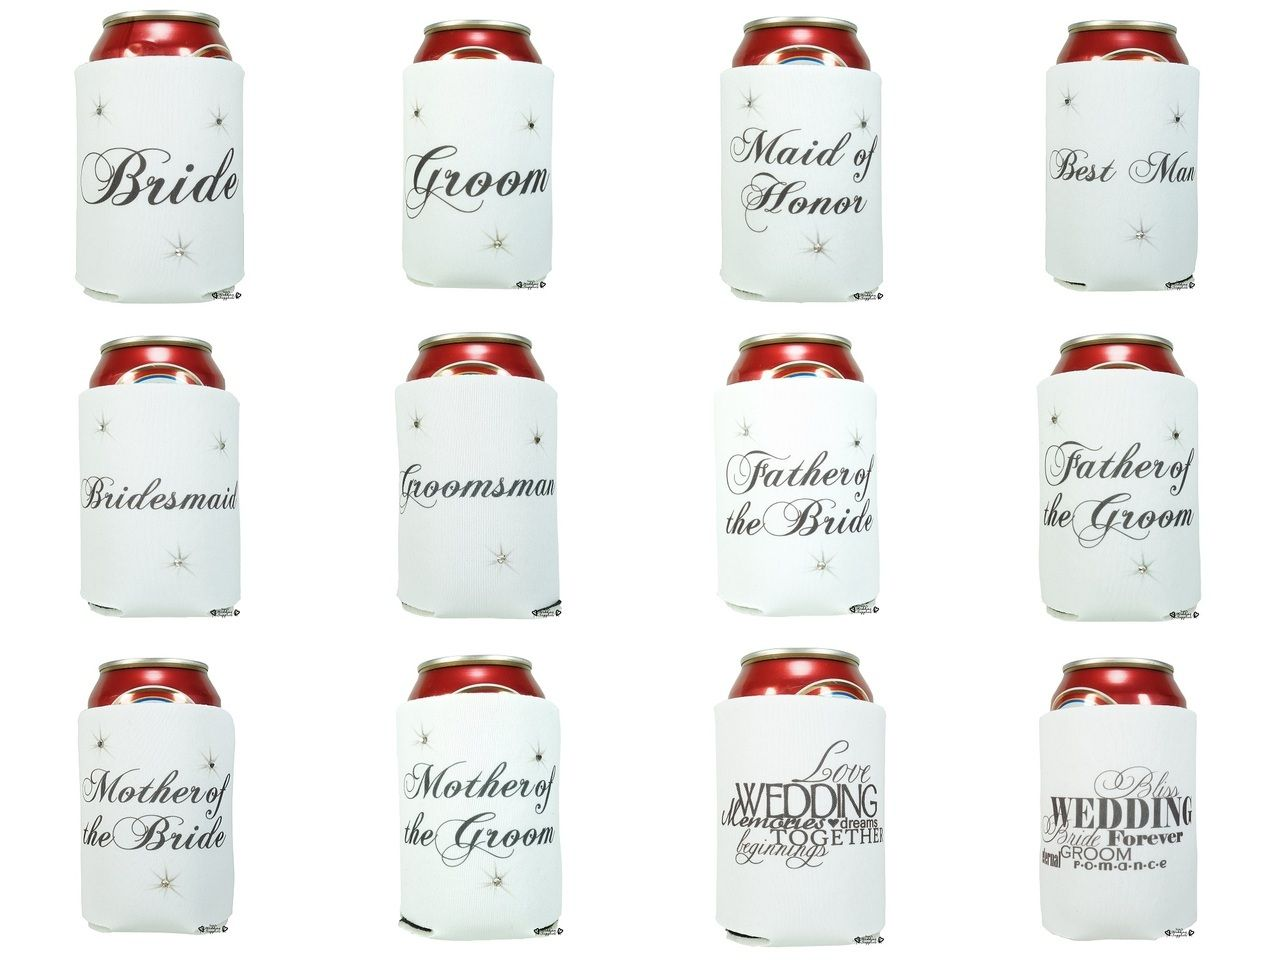 Outstanding Beer Koozie Wedding Favors Ideas - The Wedding Ideas ...